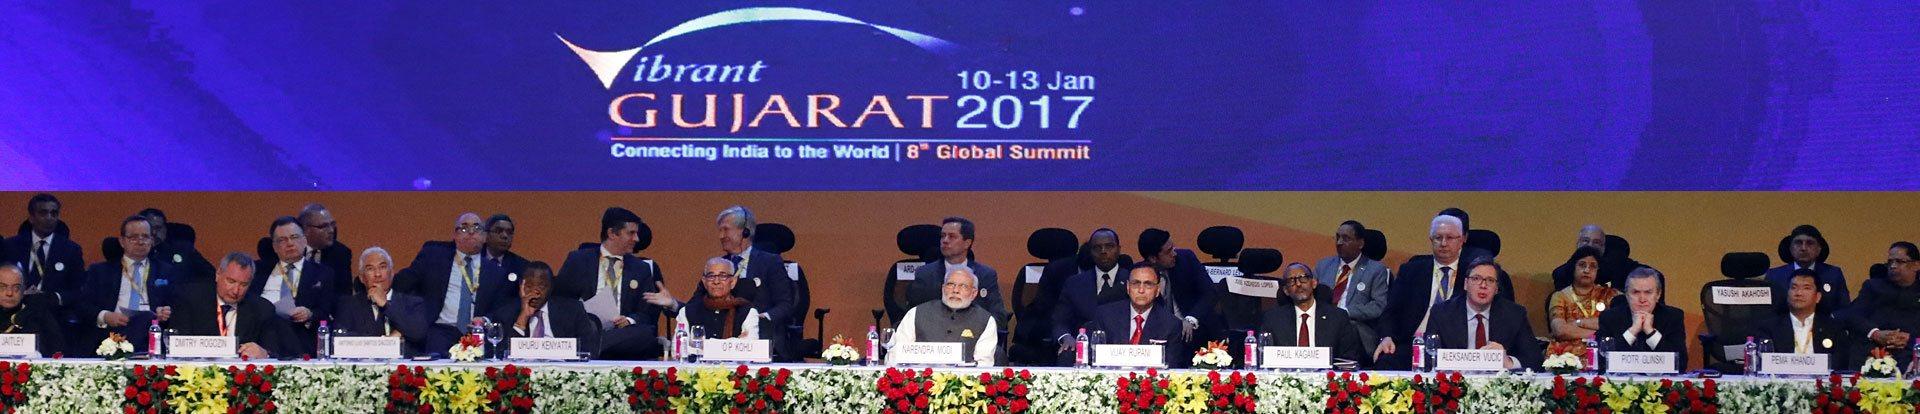 banner image of vibrant gujarat